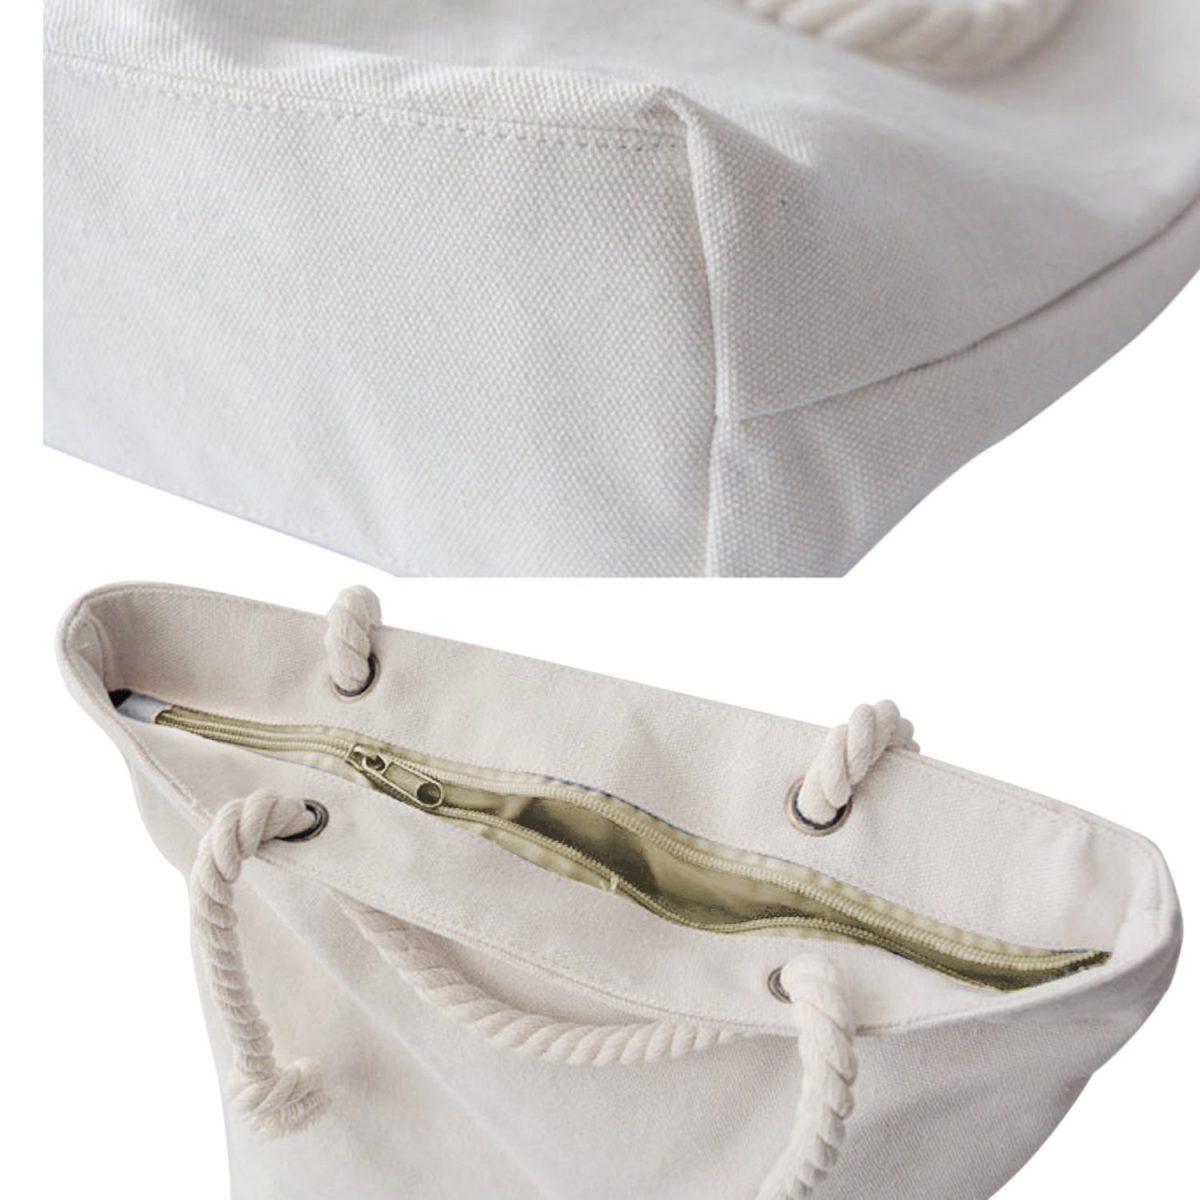 Kaktüs Desenli Watercolor Renkli Modern Fermuarlı Kumaş Çanta Realhomes